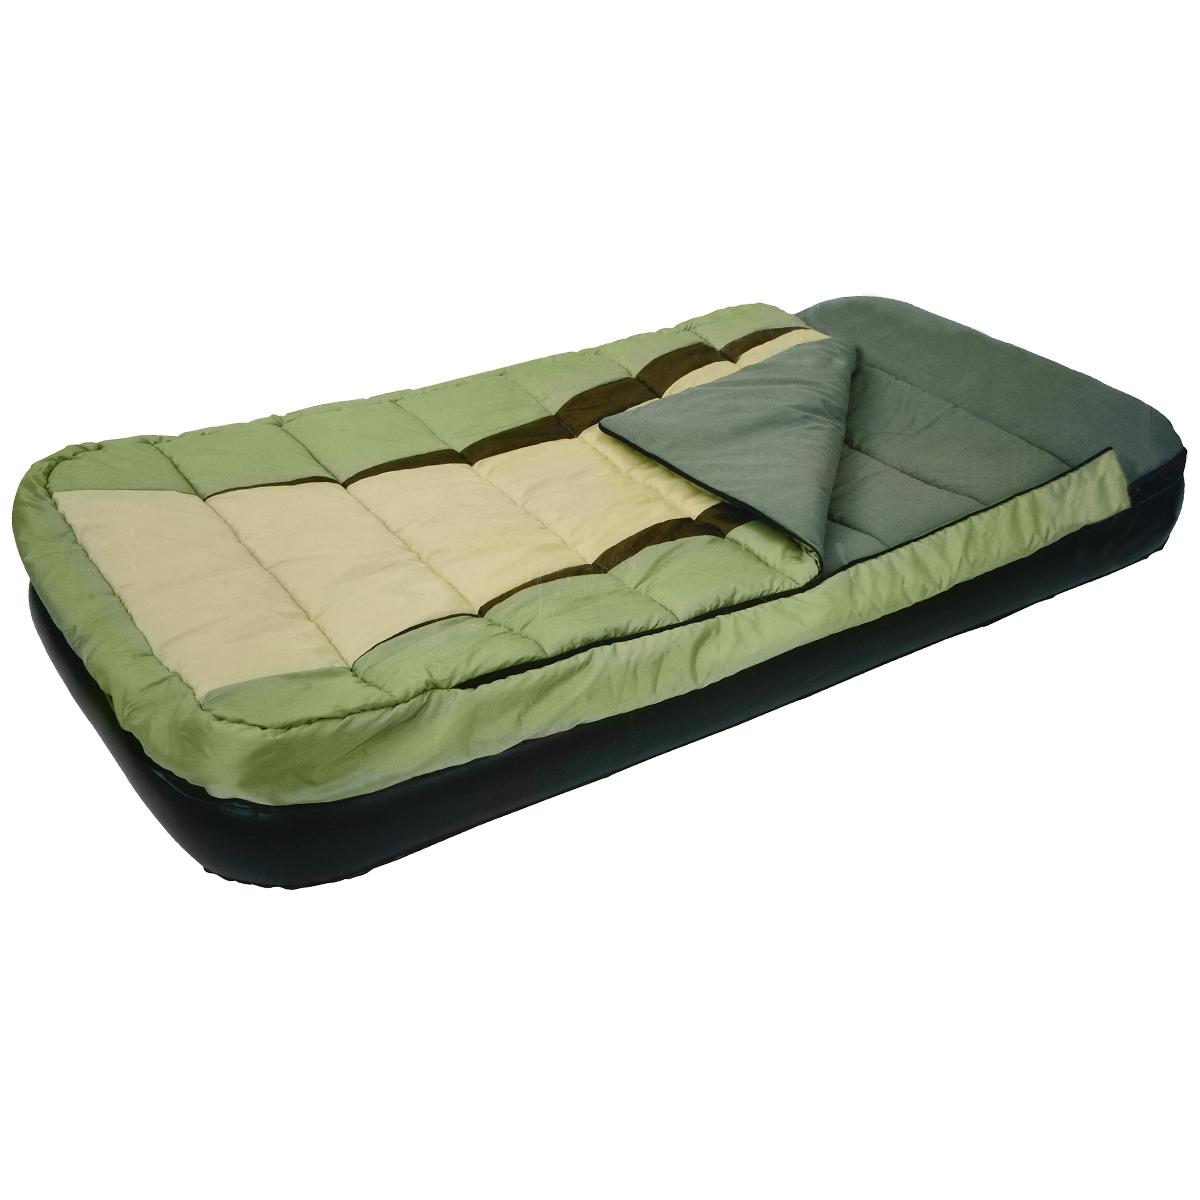 Кровать надувная Relax со спальником, 190 х 99 х 25 см burton рюкзак kettle pack